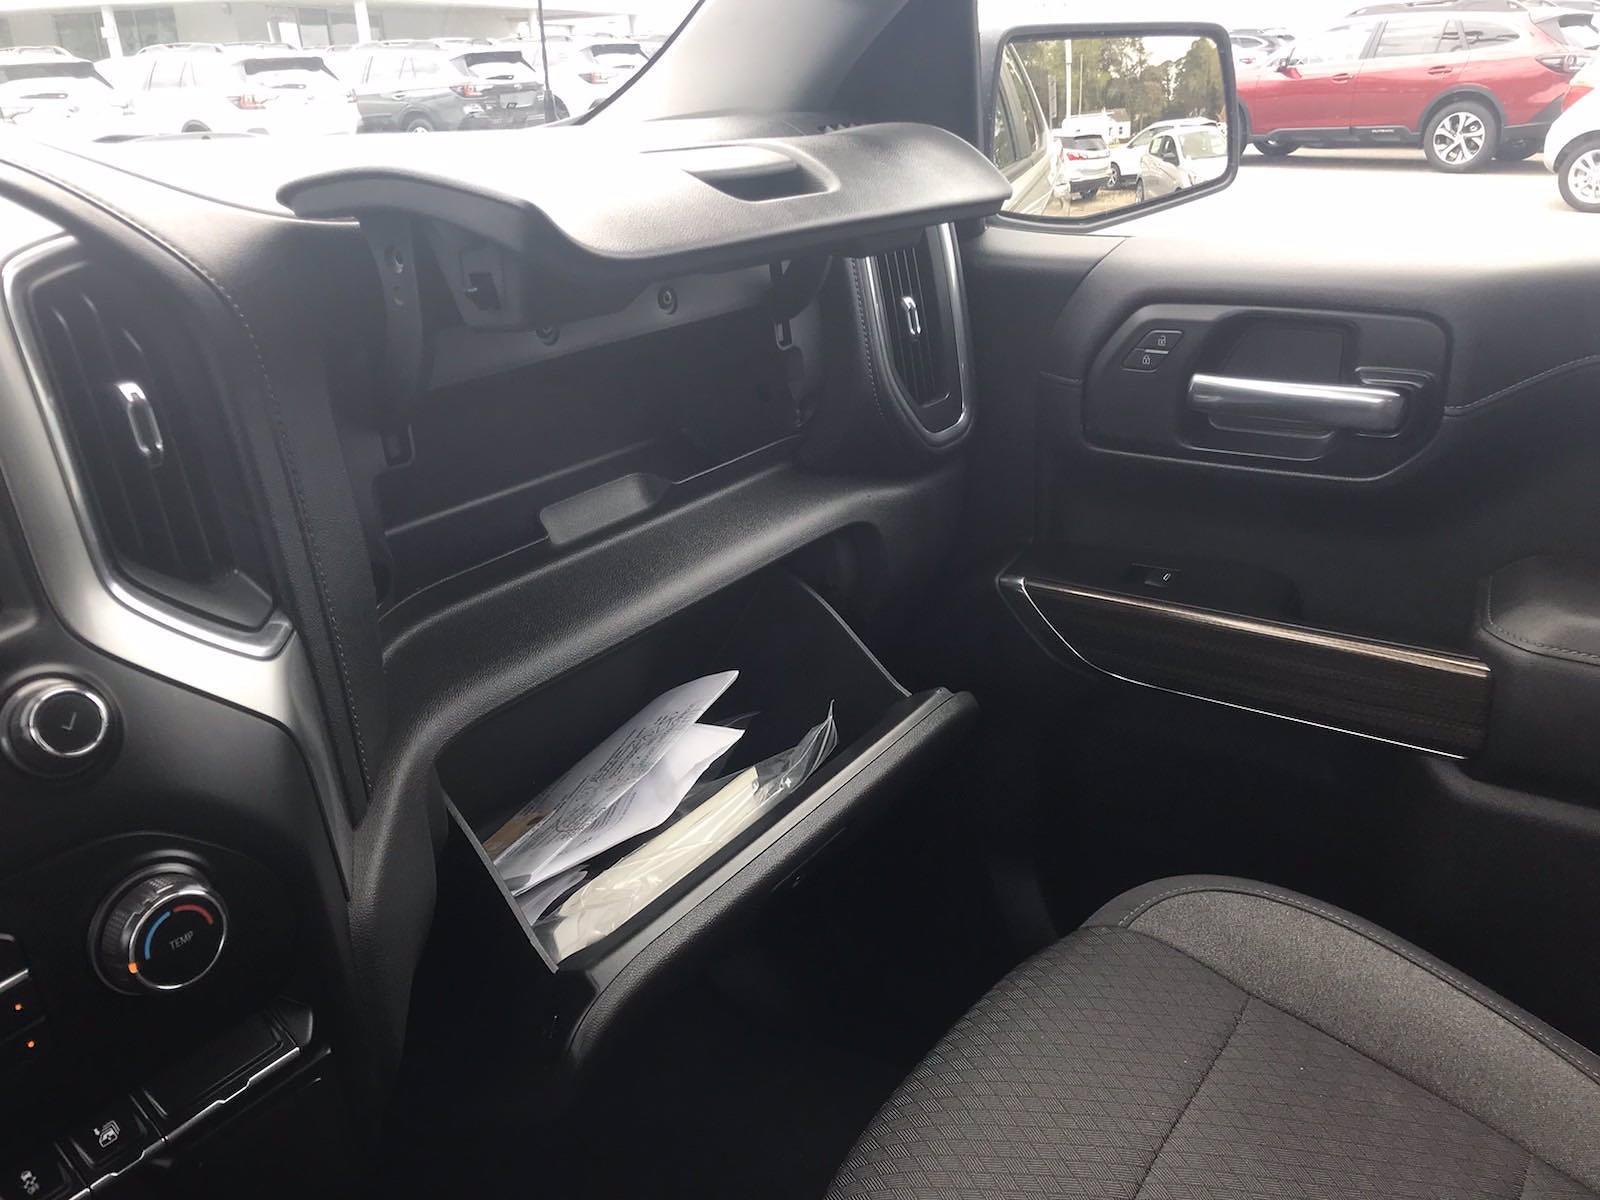 2020 Chevrolet Silverado 1500 Crew Cab 4x4, Pickup #16449PN - photo 39